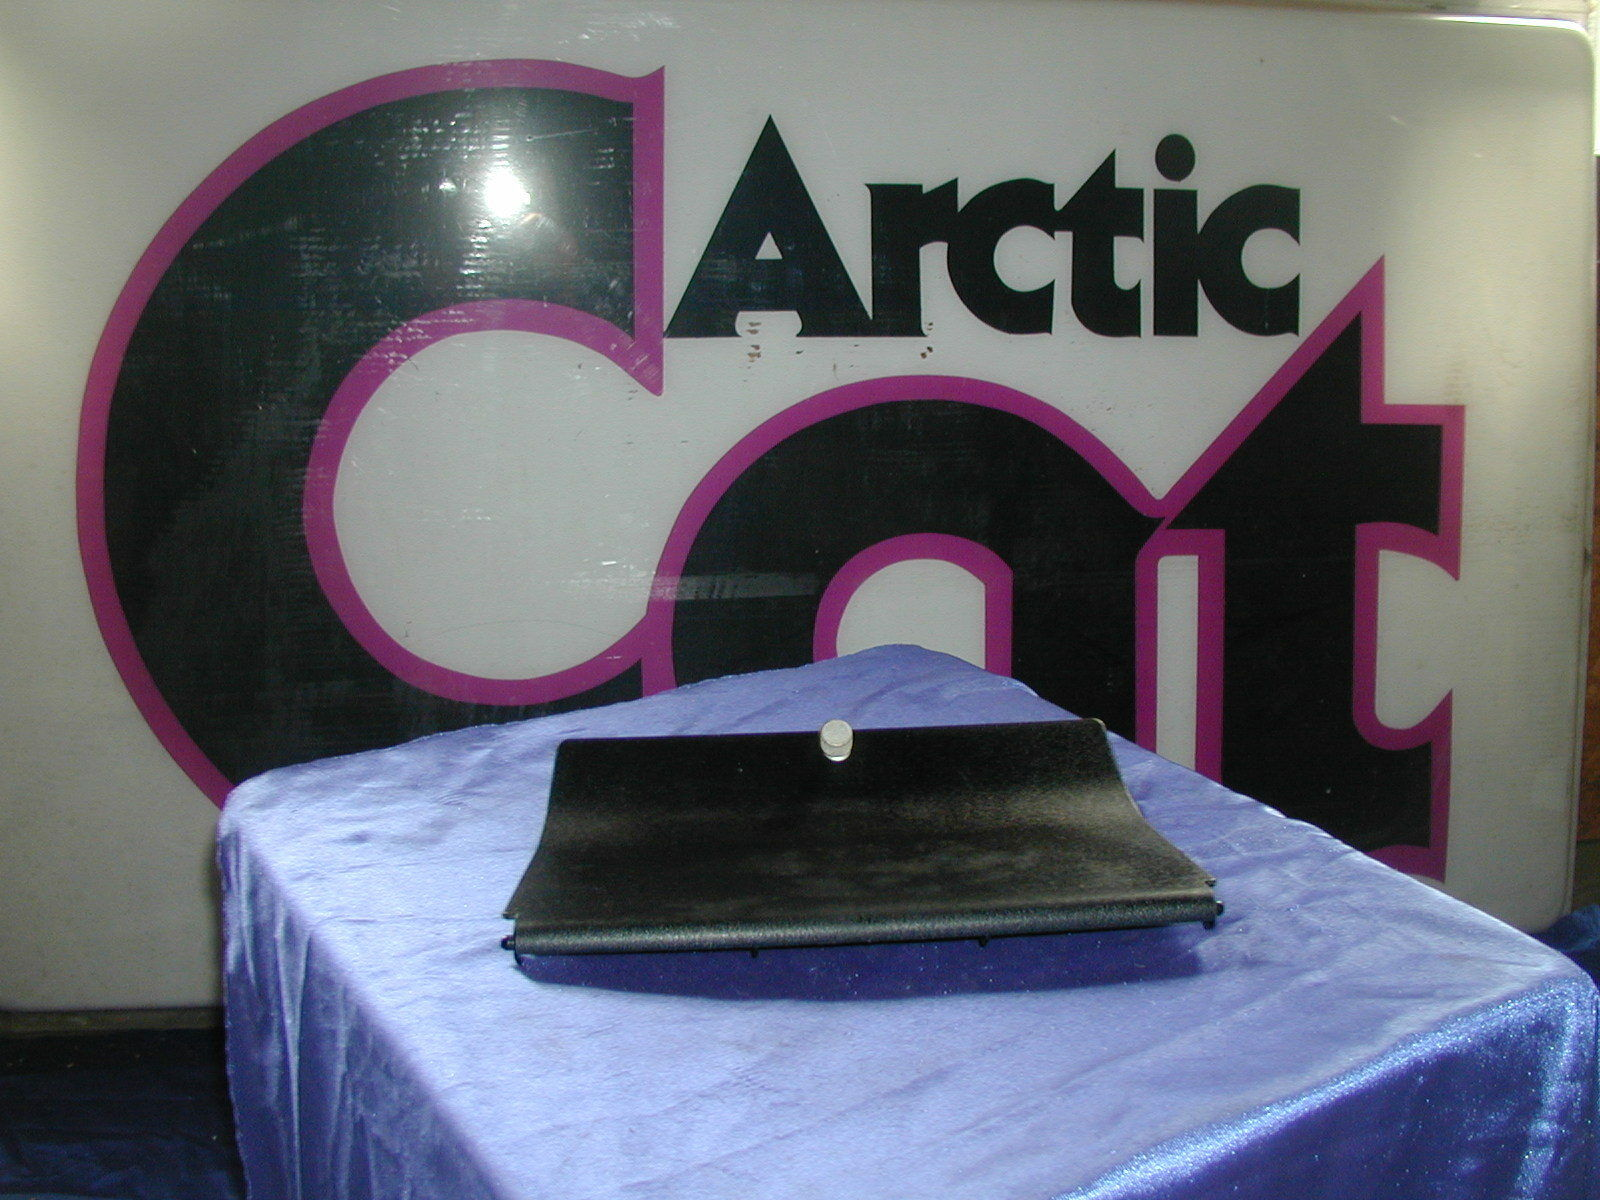 Arctic Cat Toolbox Console Door, Lid '73 Panther NOS Vintage